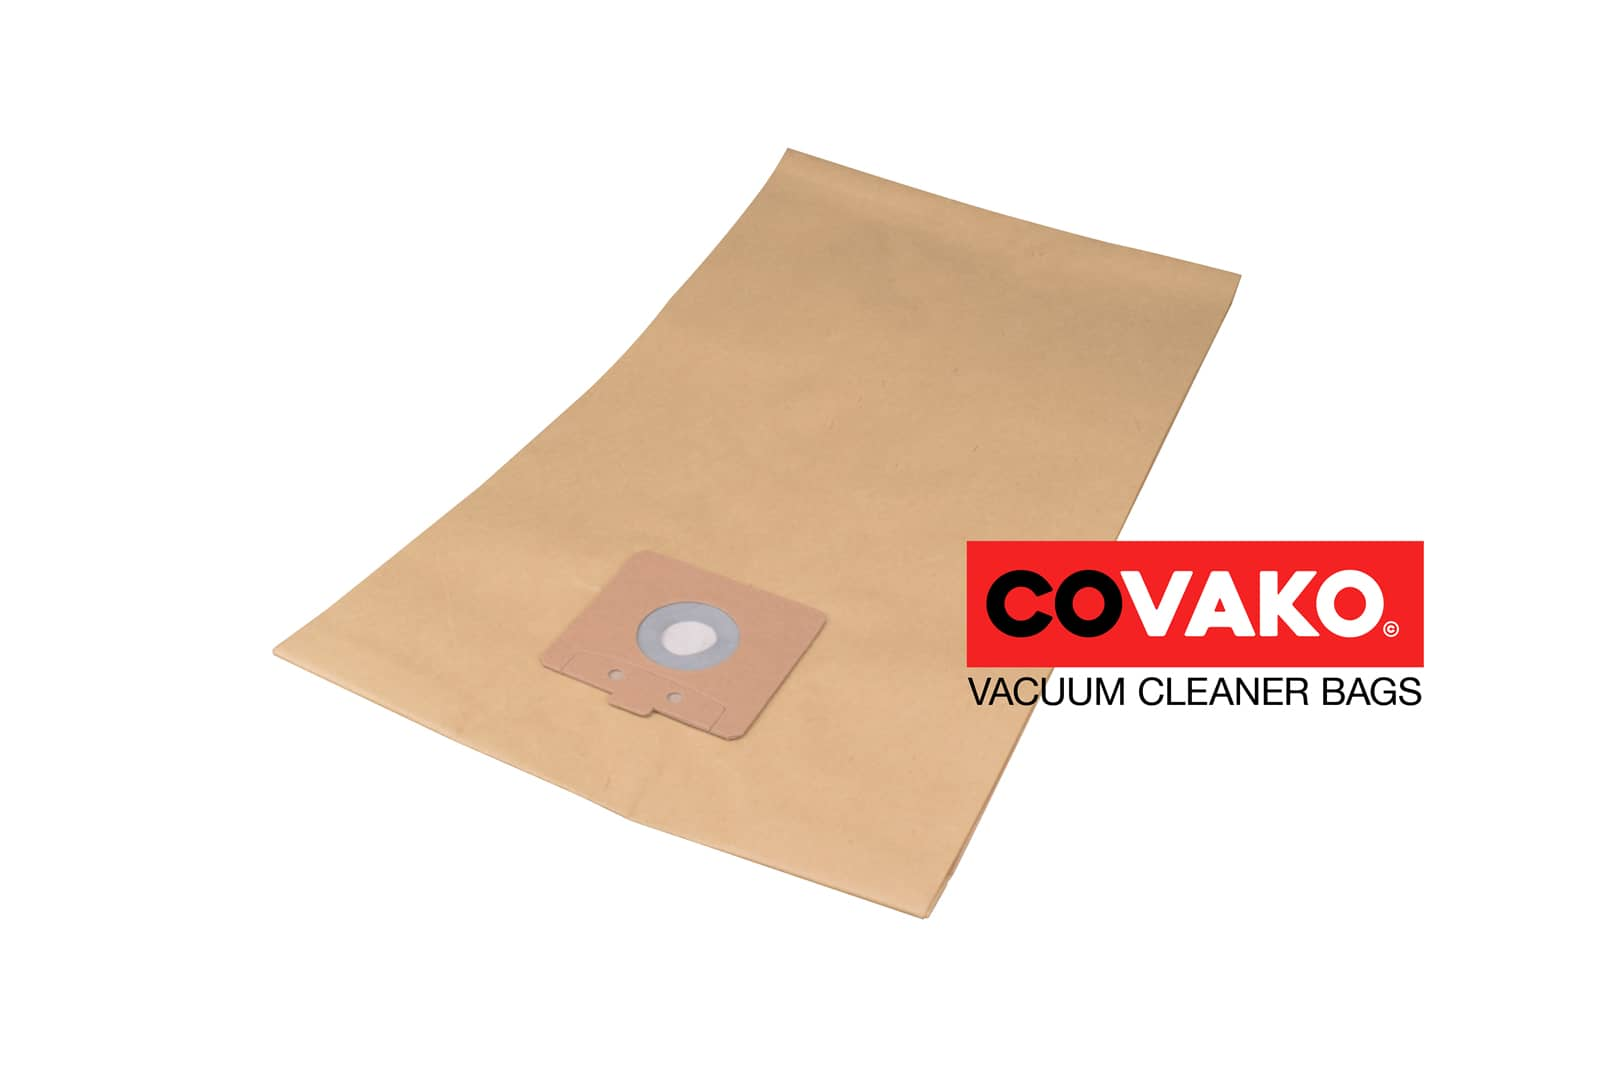 Johnson Diversy Vacumat 12 / Papier - Johnson Diversy stofzuigerzakken